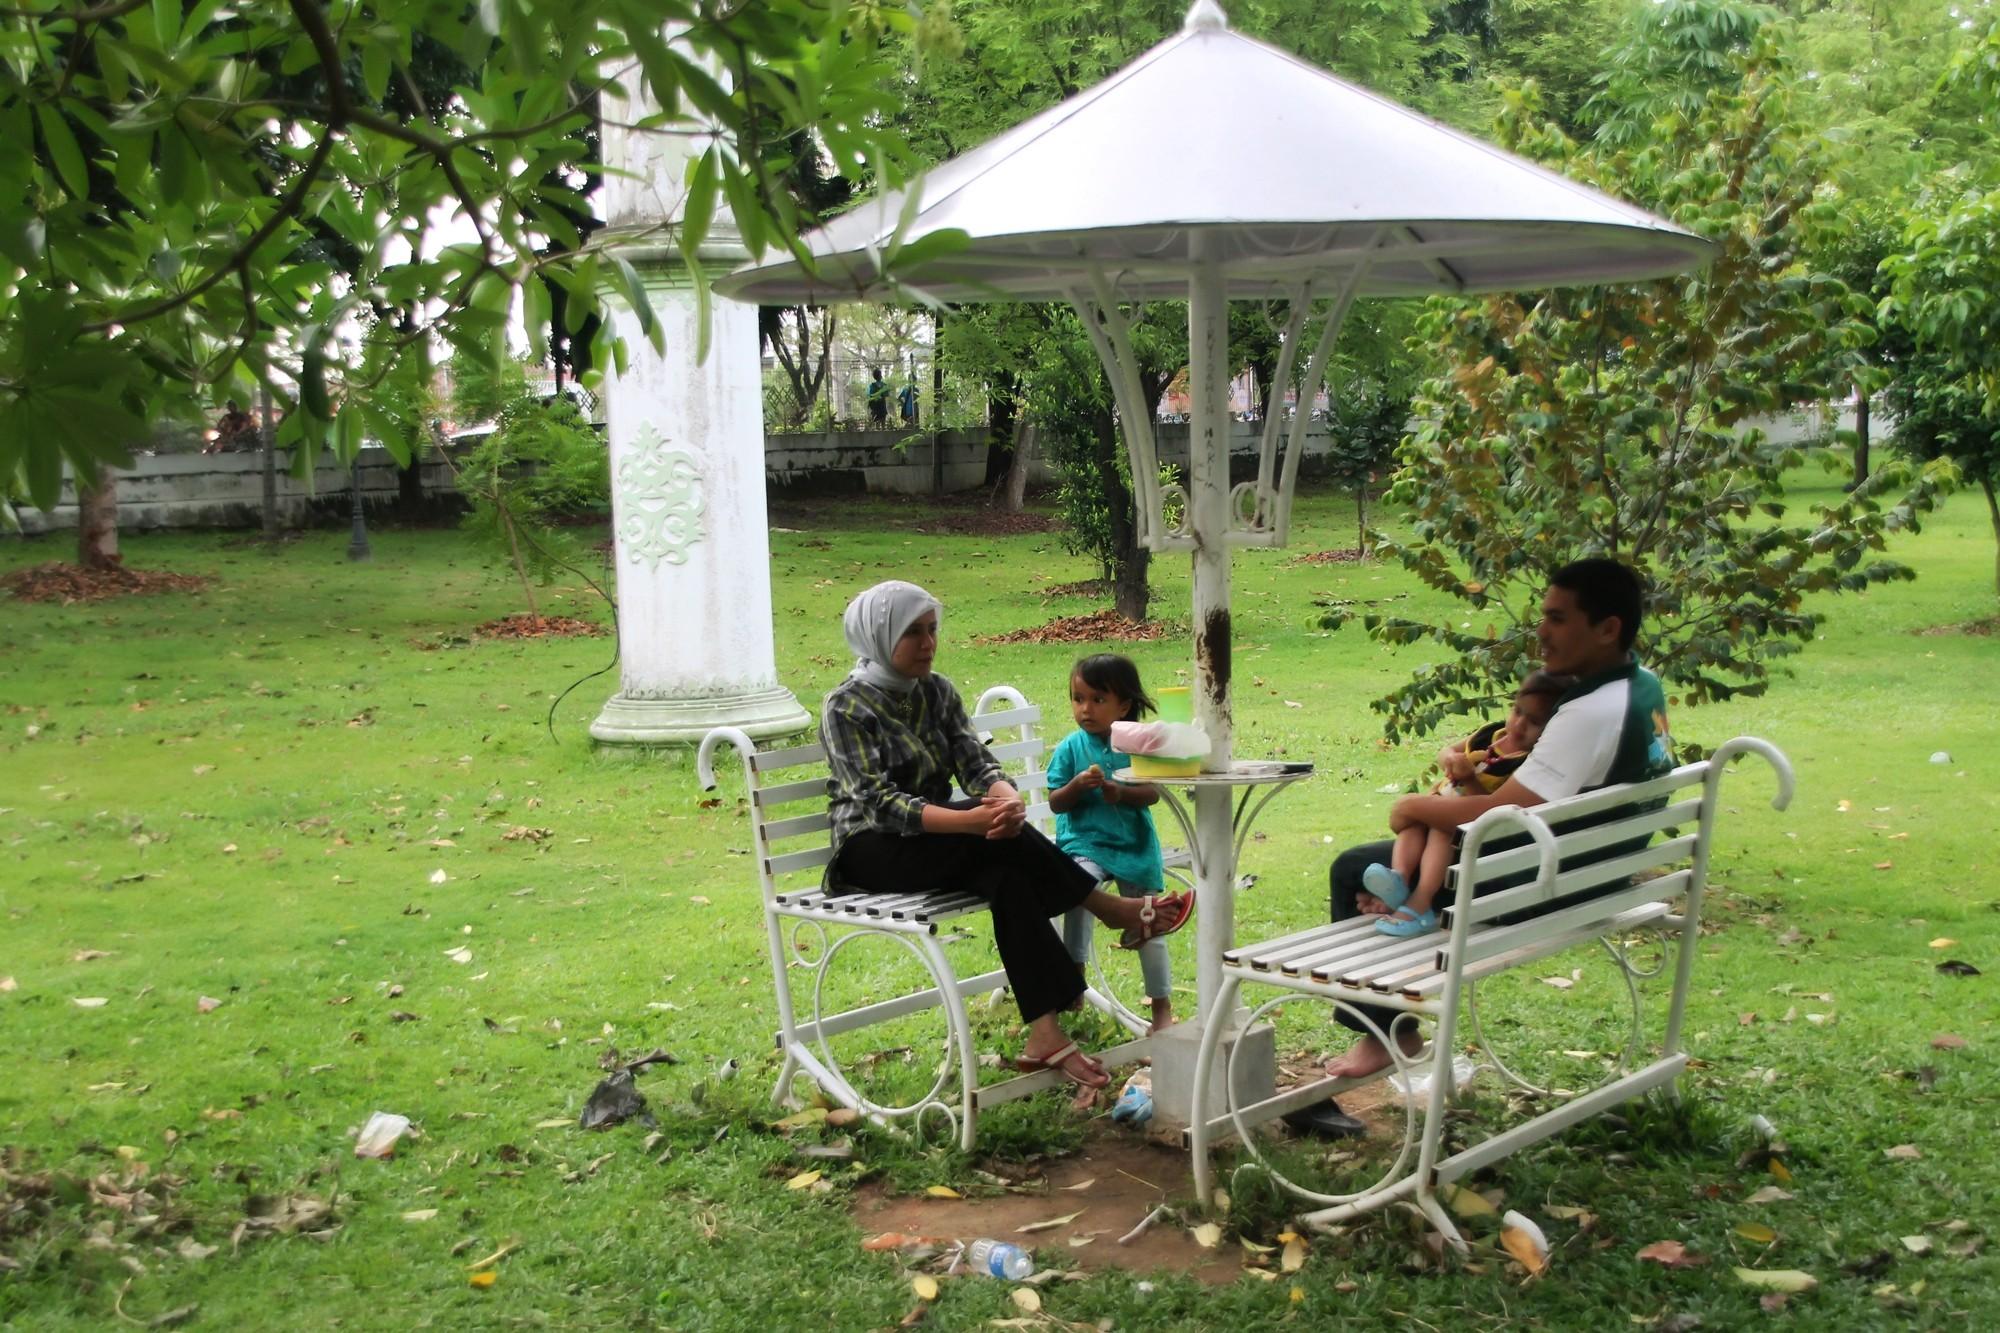 Taman ini menjadi tempat yang tepat untuk bercengkerama bersama keluarga di sore hari